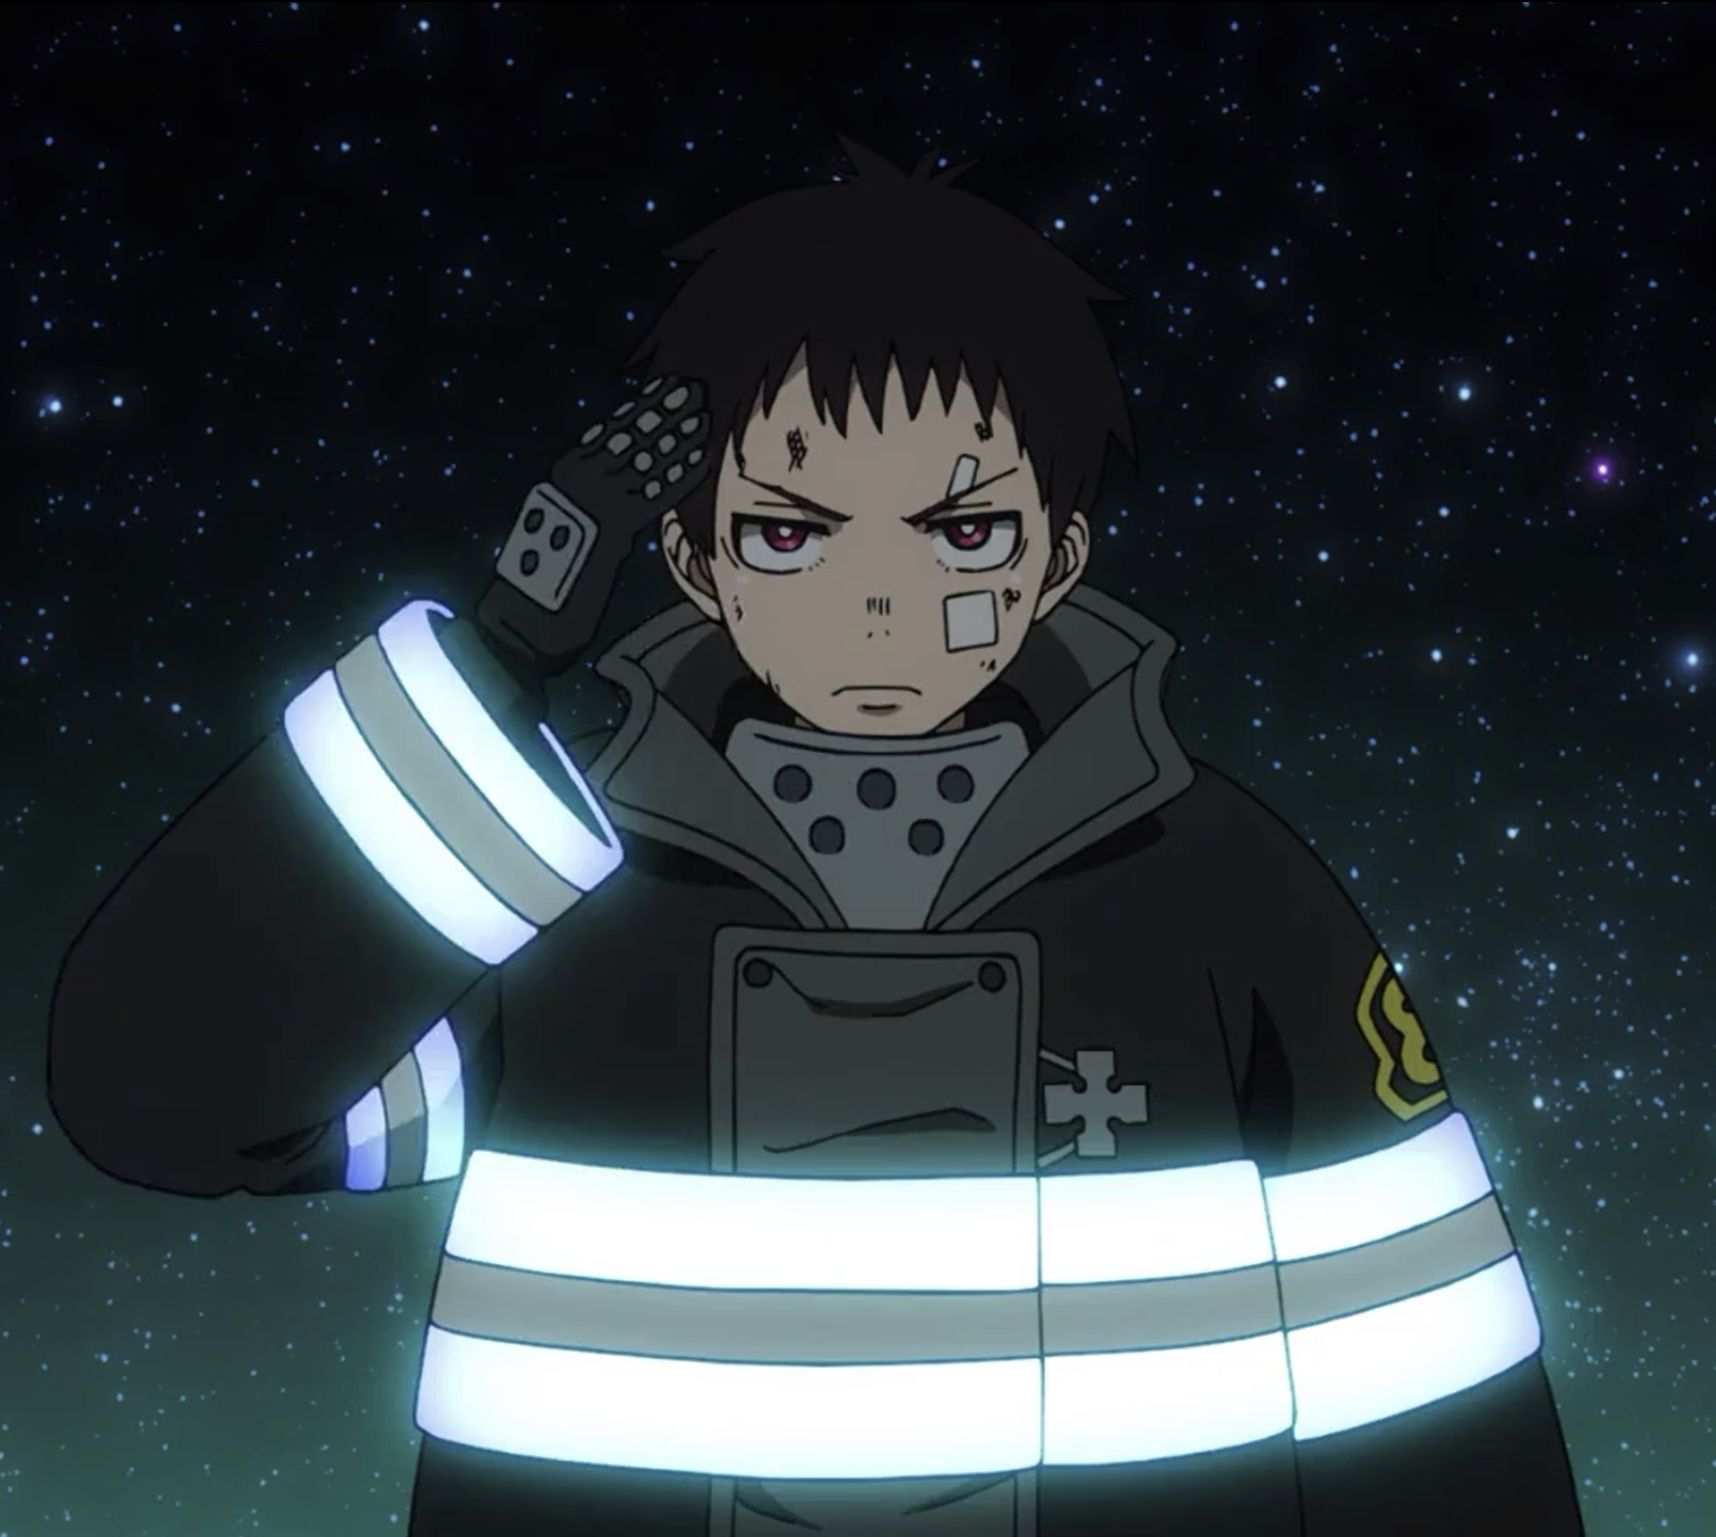 Enn Enn no Shouboutai Shinra kusakabe, Anime, Anime summer